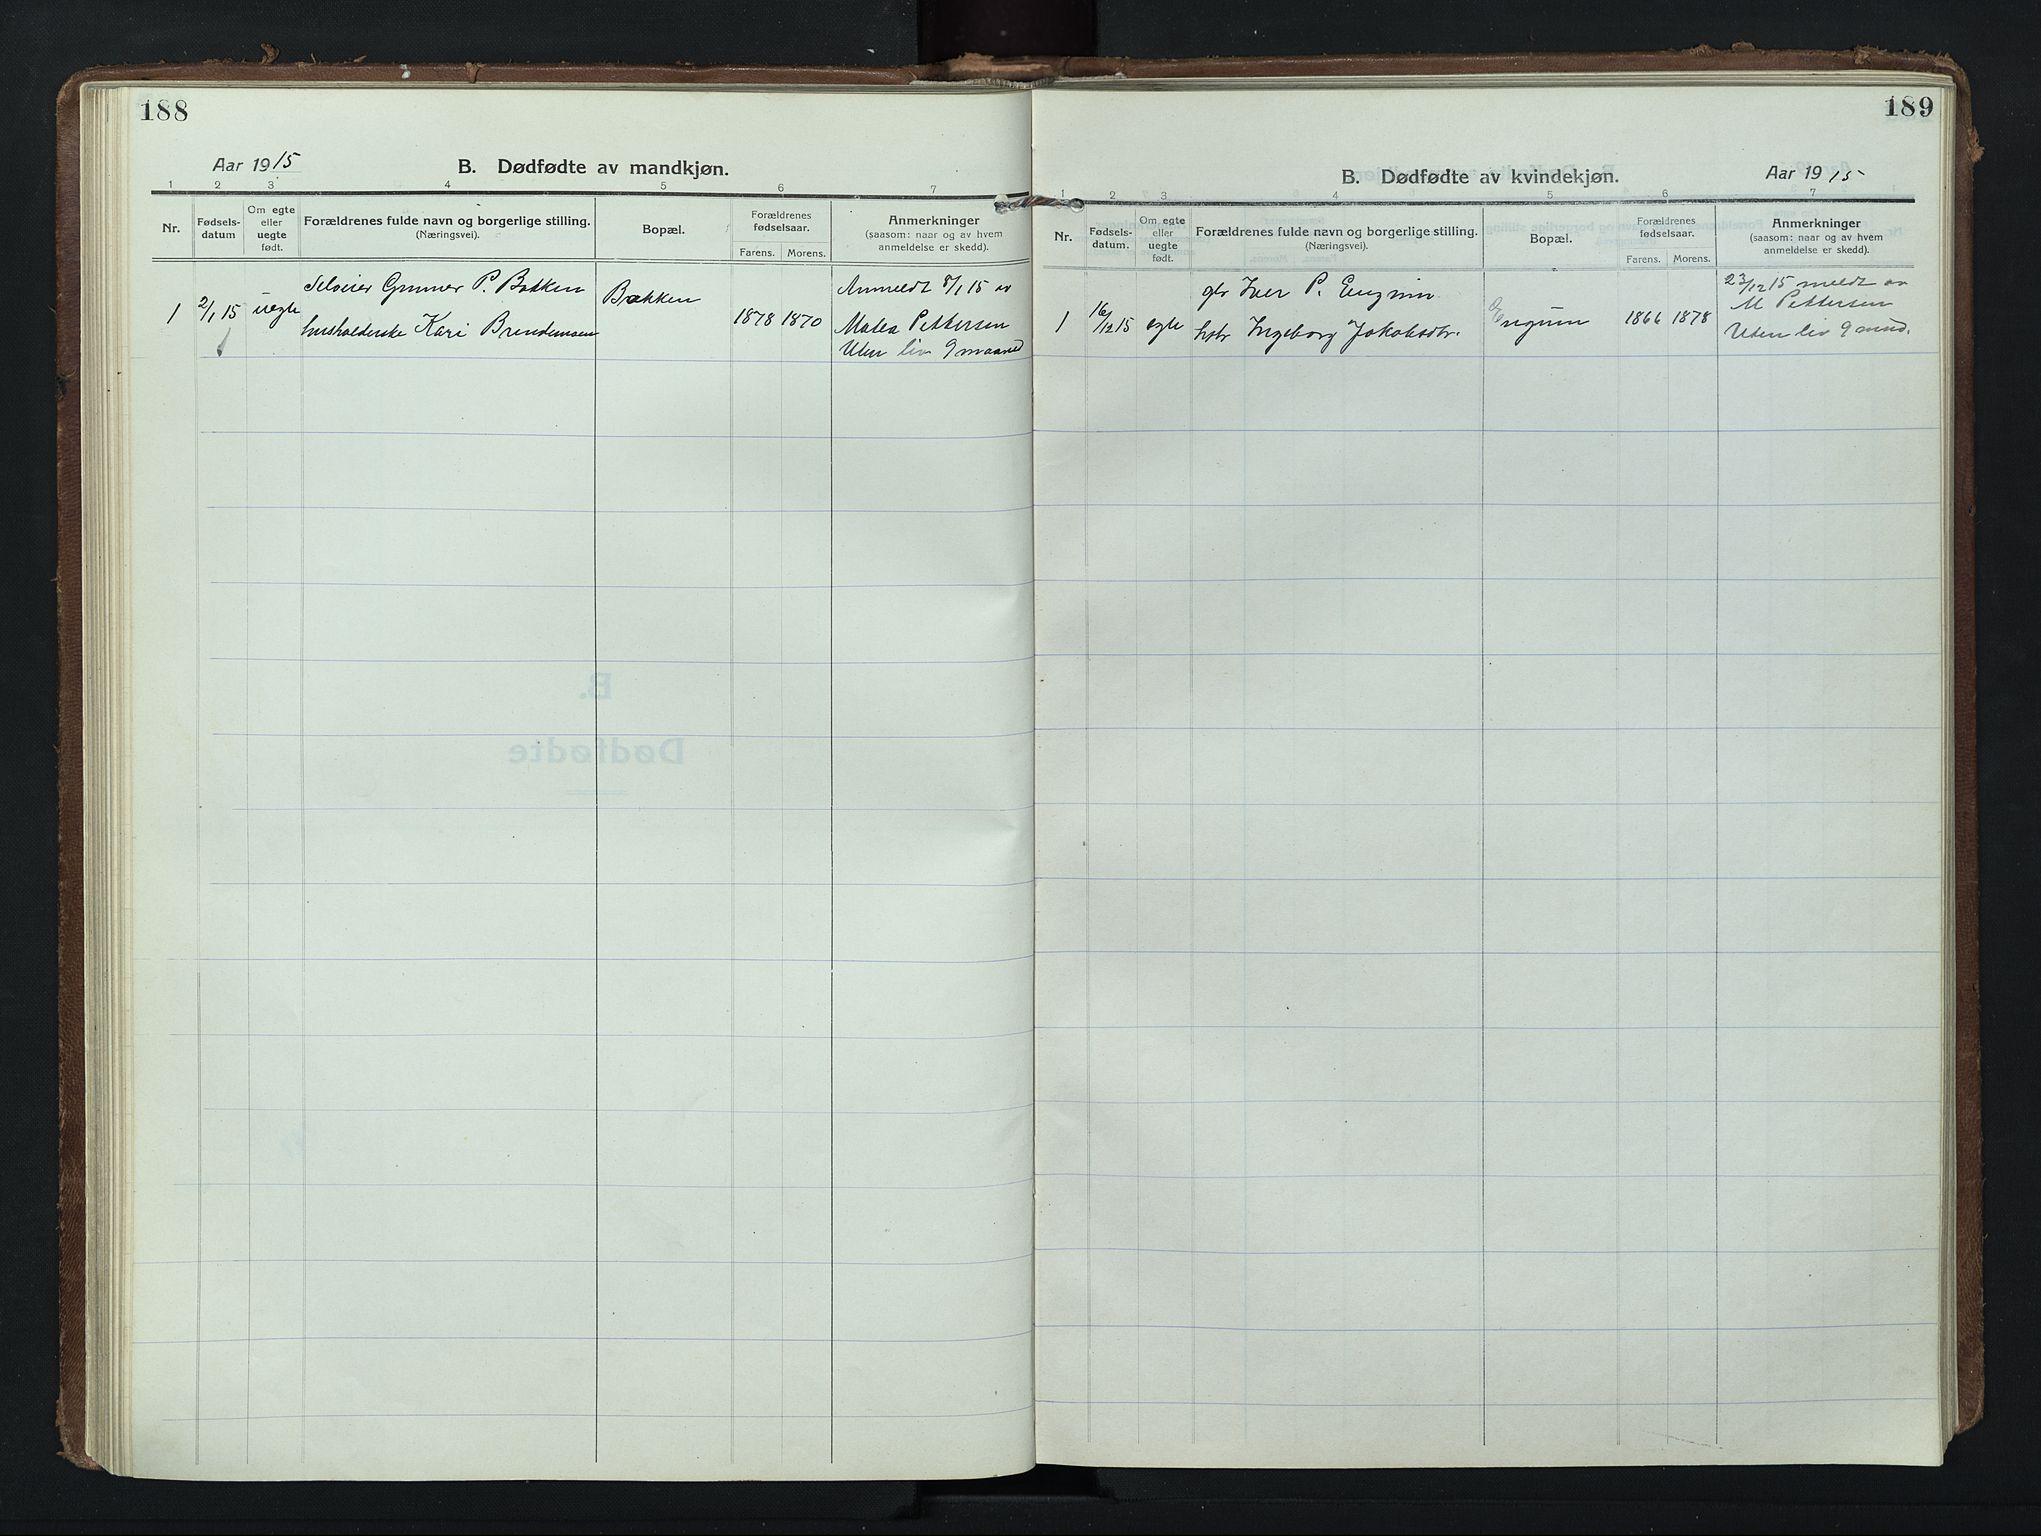 SAH, Nord-Fron prestekontor, Klokkerbok nr. 8, 1915-1948, s. 188-189